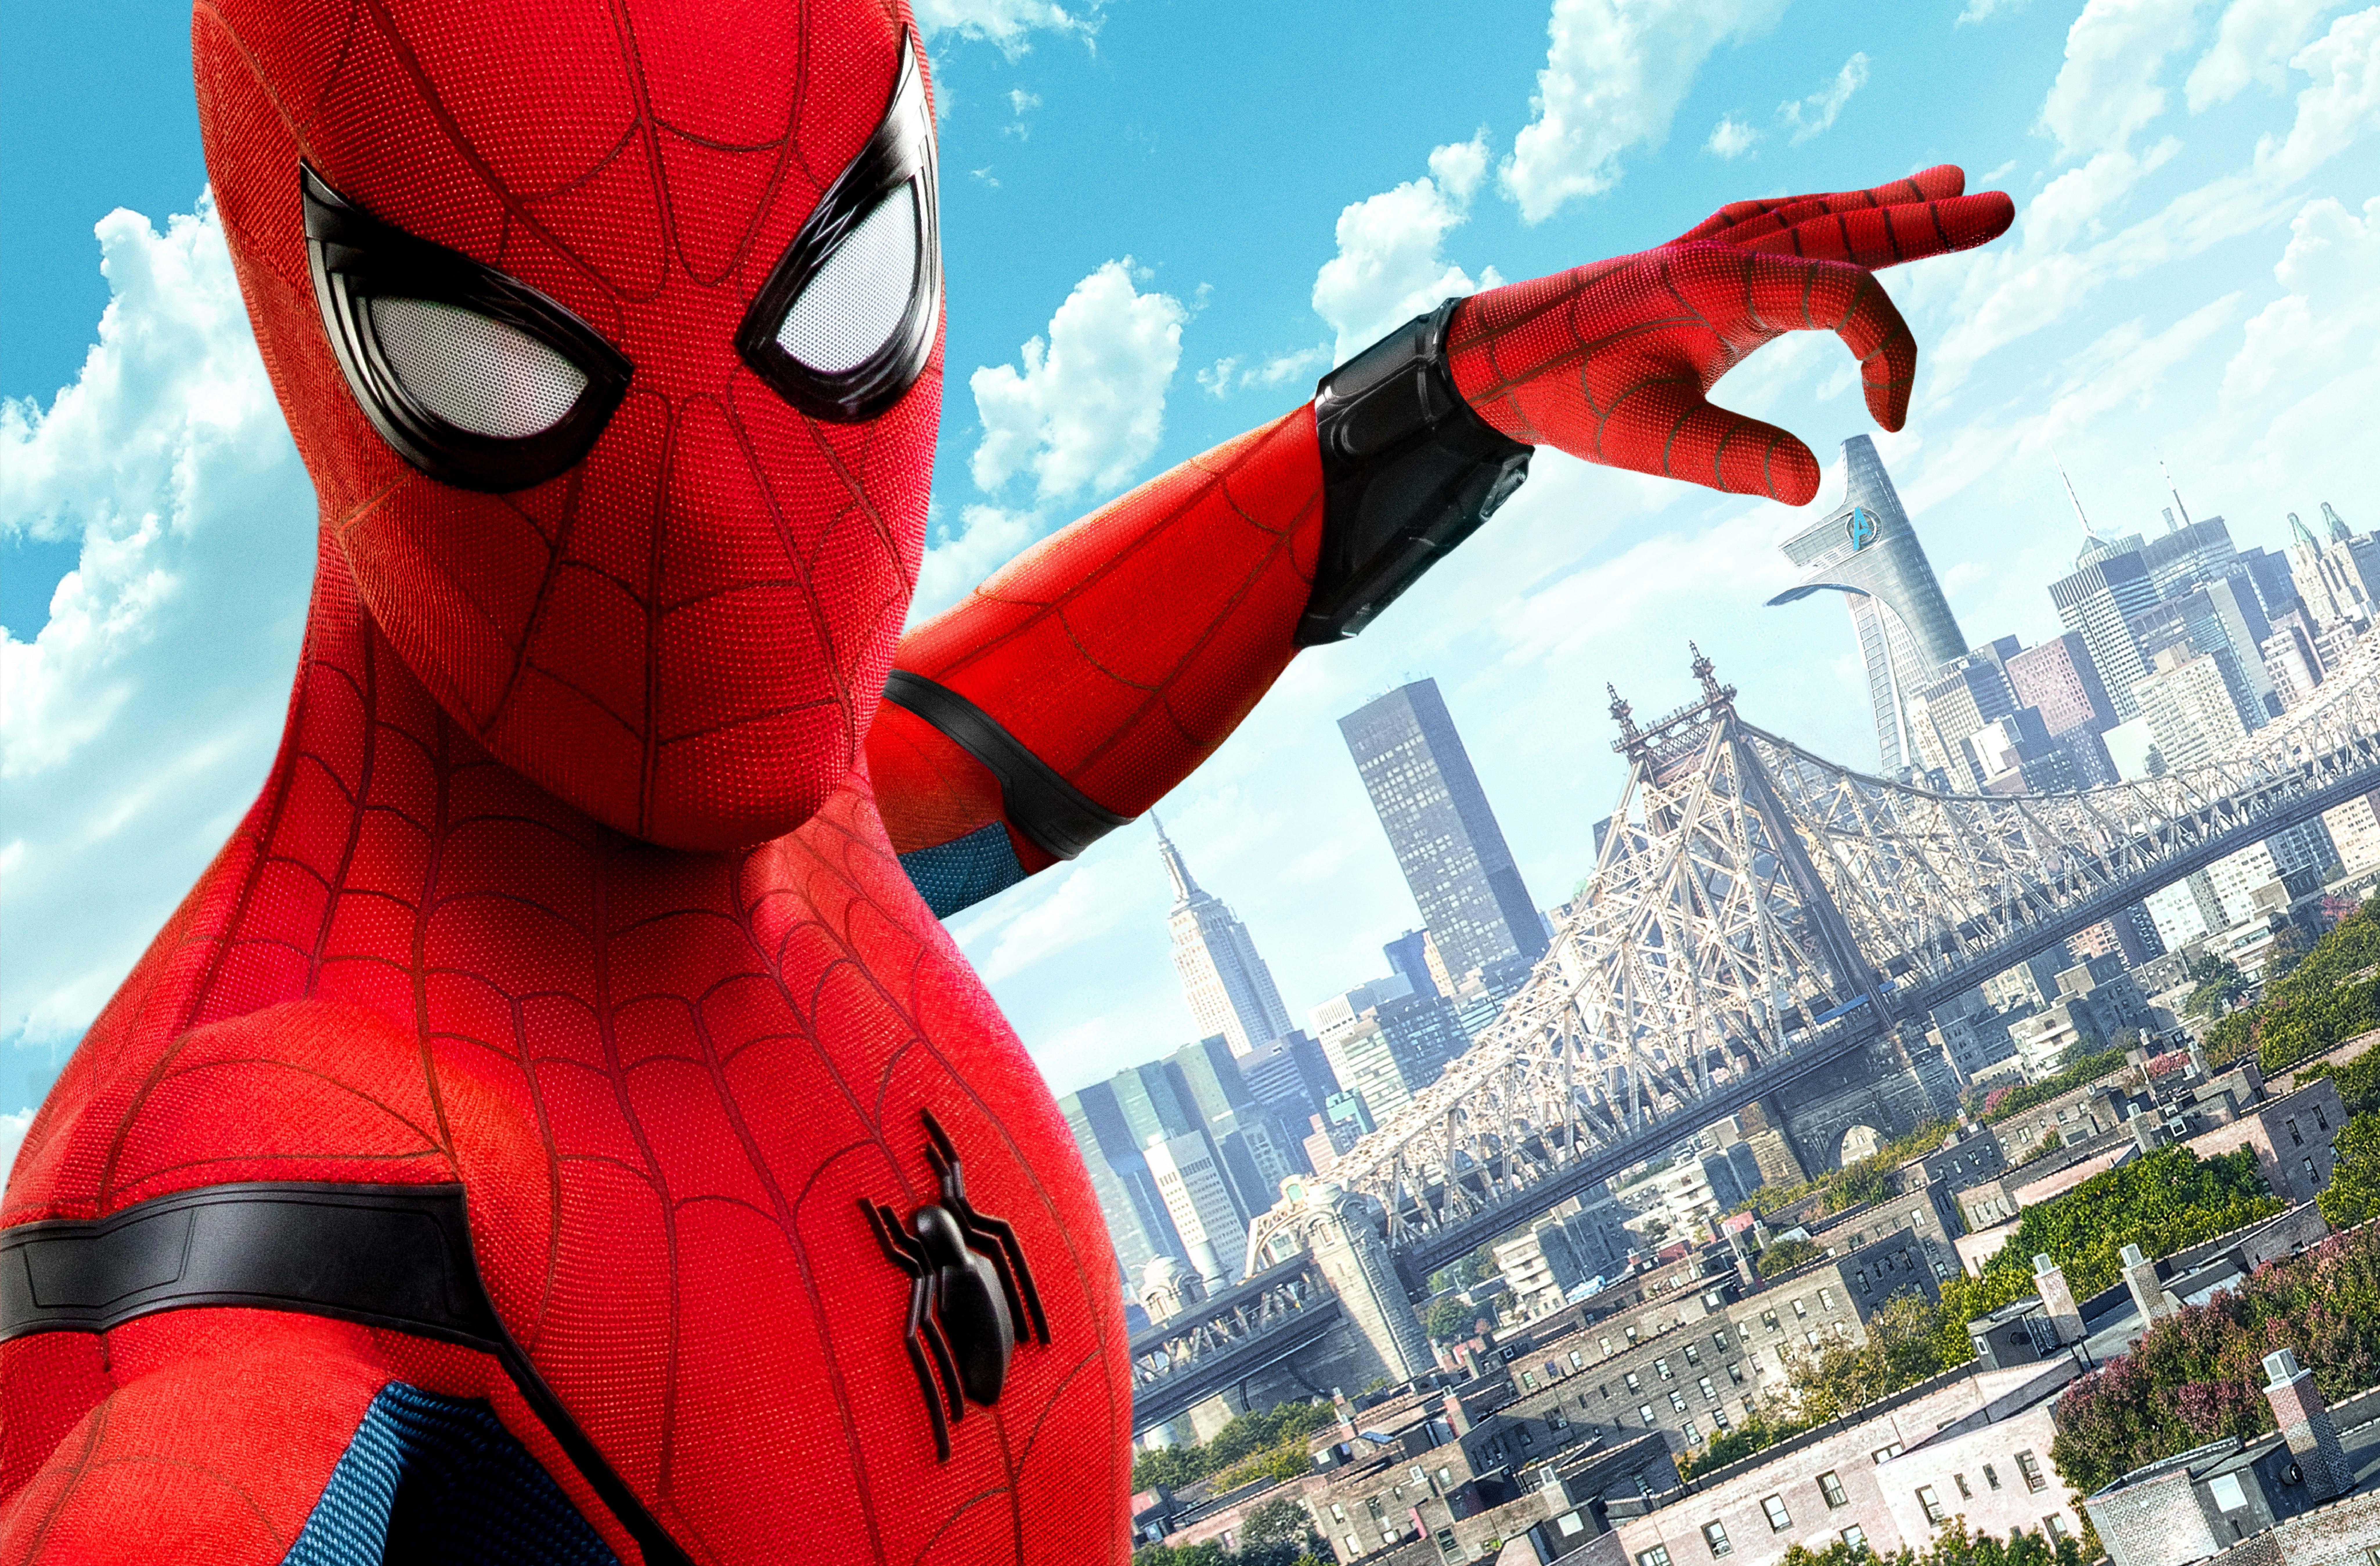 2048x1152 spiderman homecoming 2017 8k 2048x1152 for Fondos de spiderman